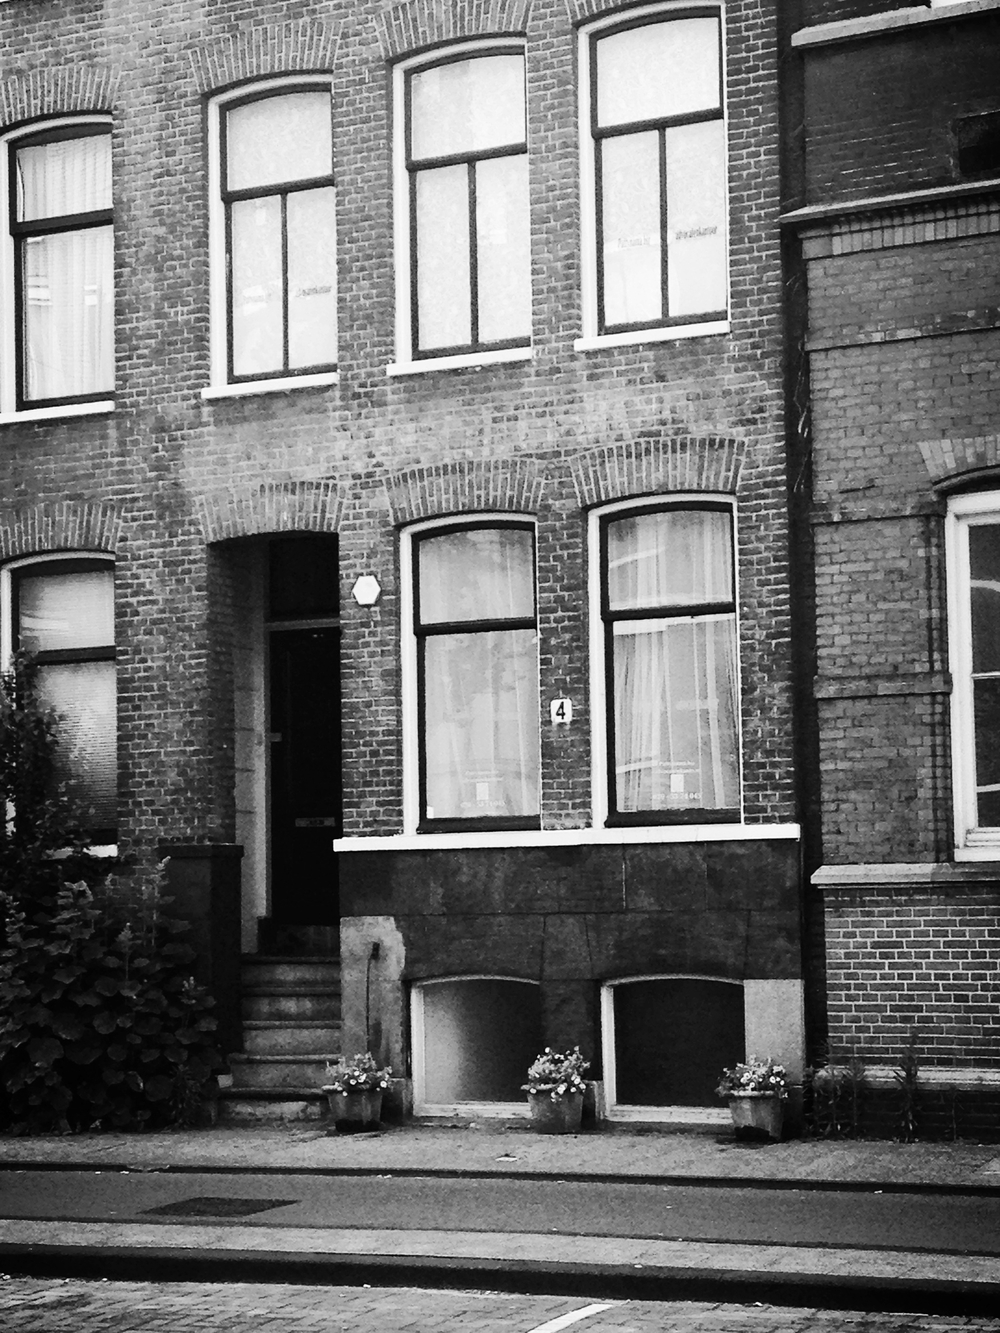 Pattynama.biz advocatenkantoor Marnixstraat 4hs, Amsterdam